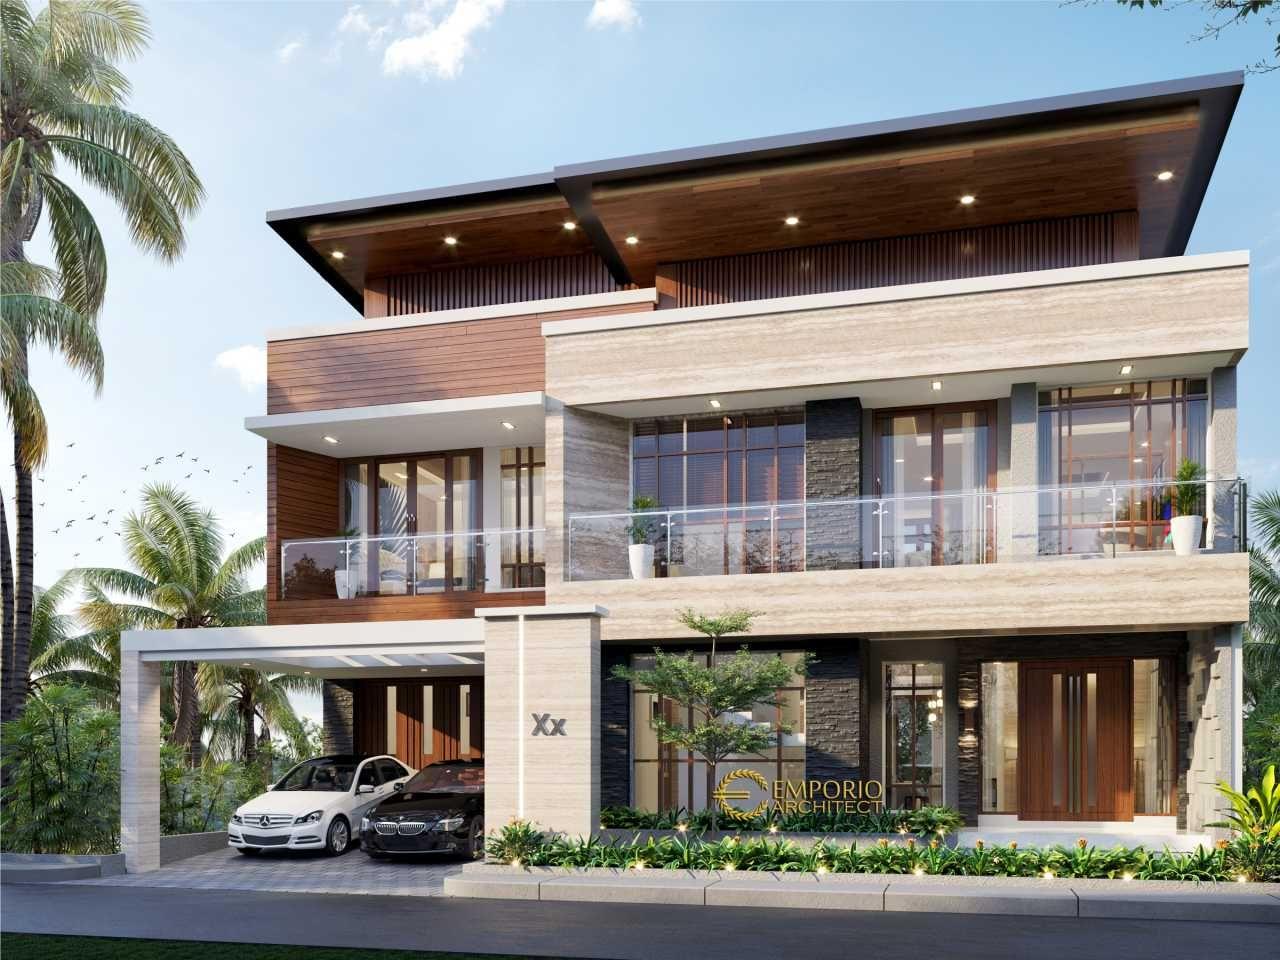 Desain Eksterior Kontemporer Cek Bahan Bangunan